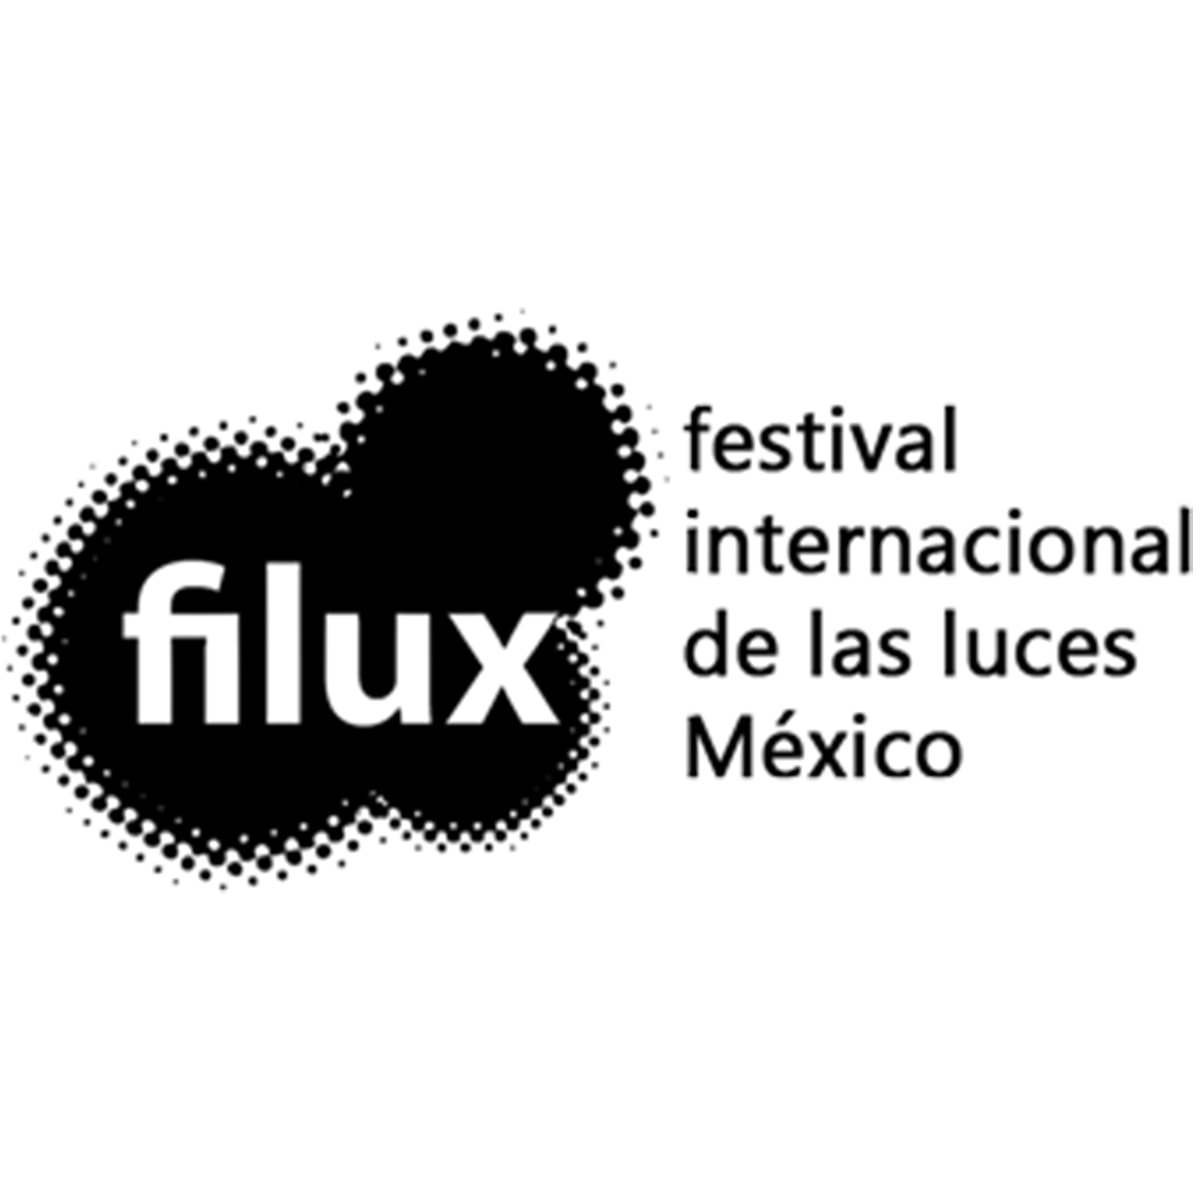 FILUX, Light festival of Mexico